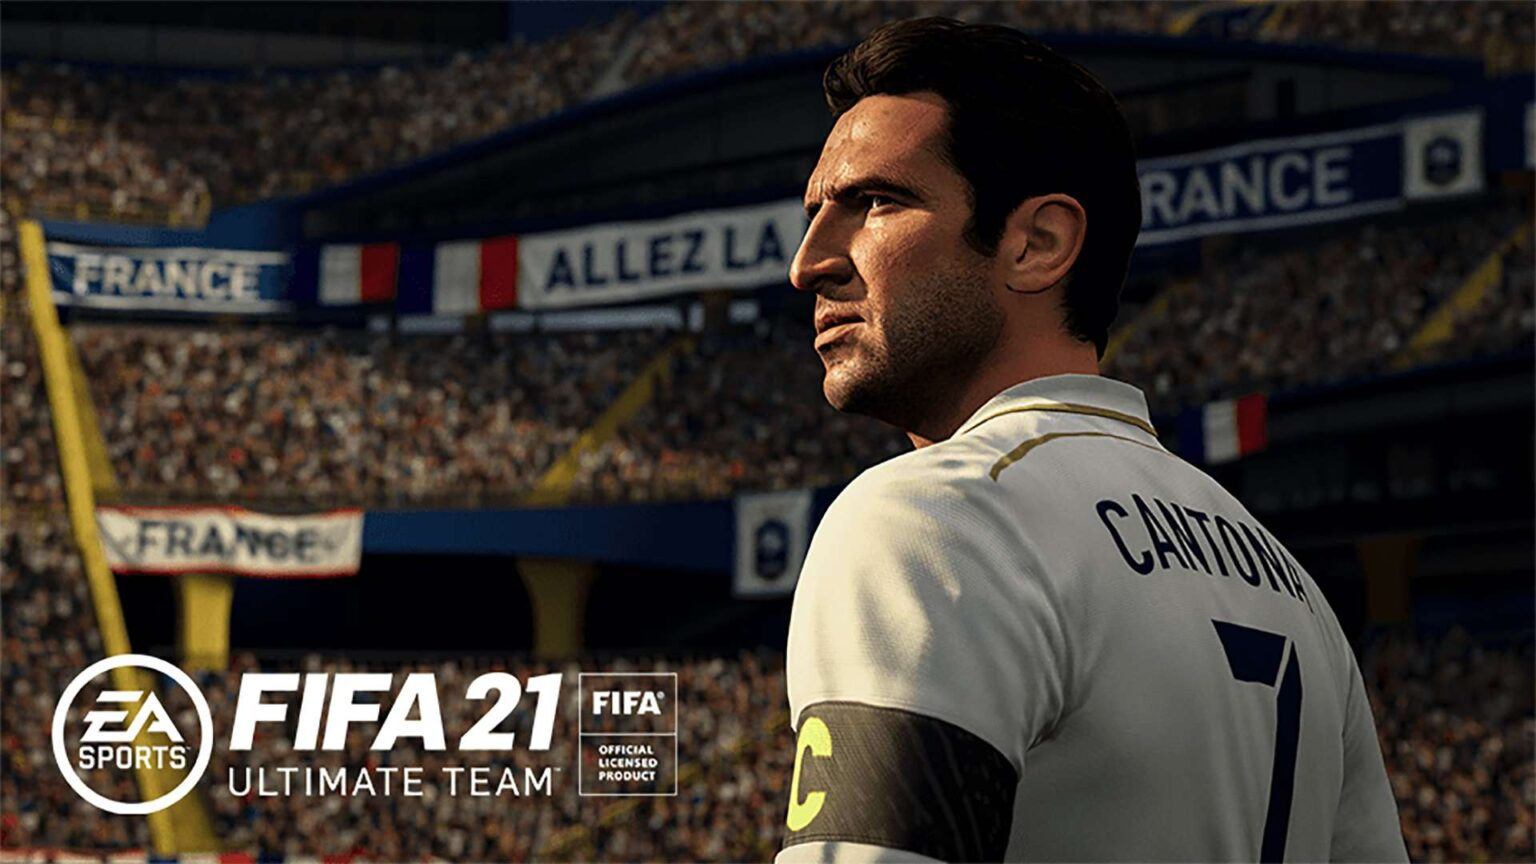 FIFA 21 FREE DOWNLOAD FULL VERSION NINTENDO SWITCH SETUP